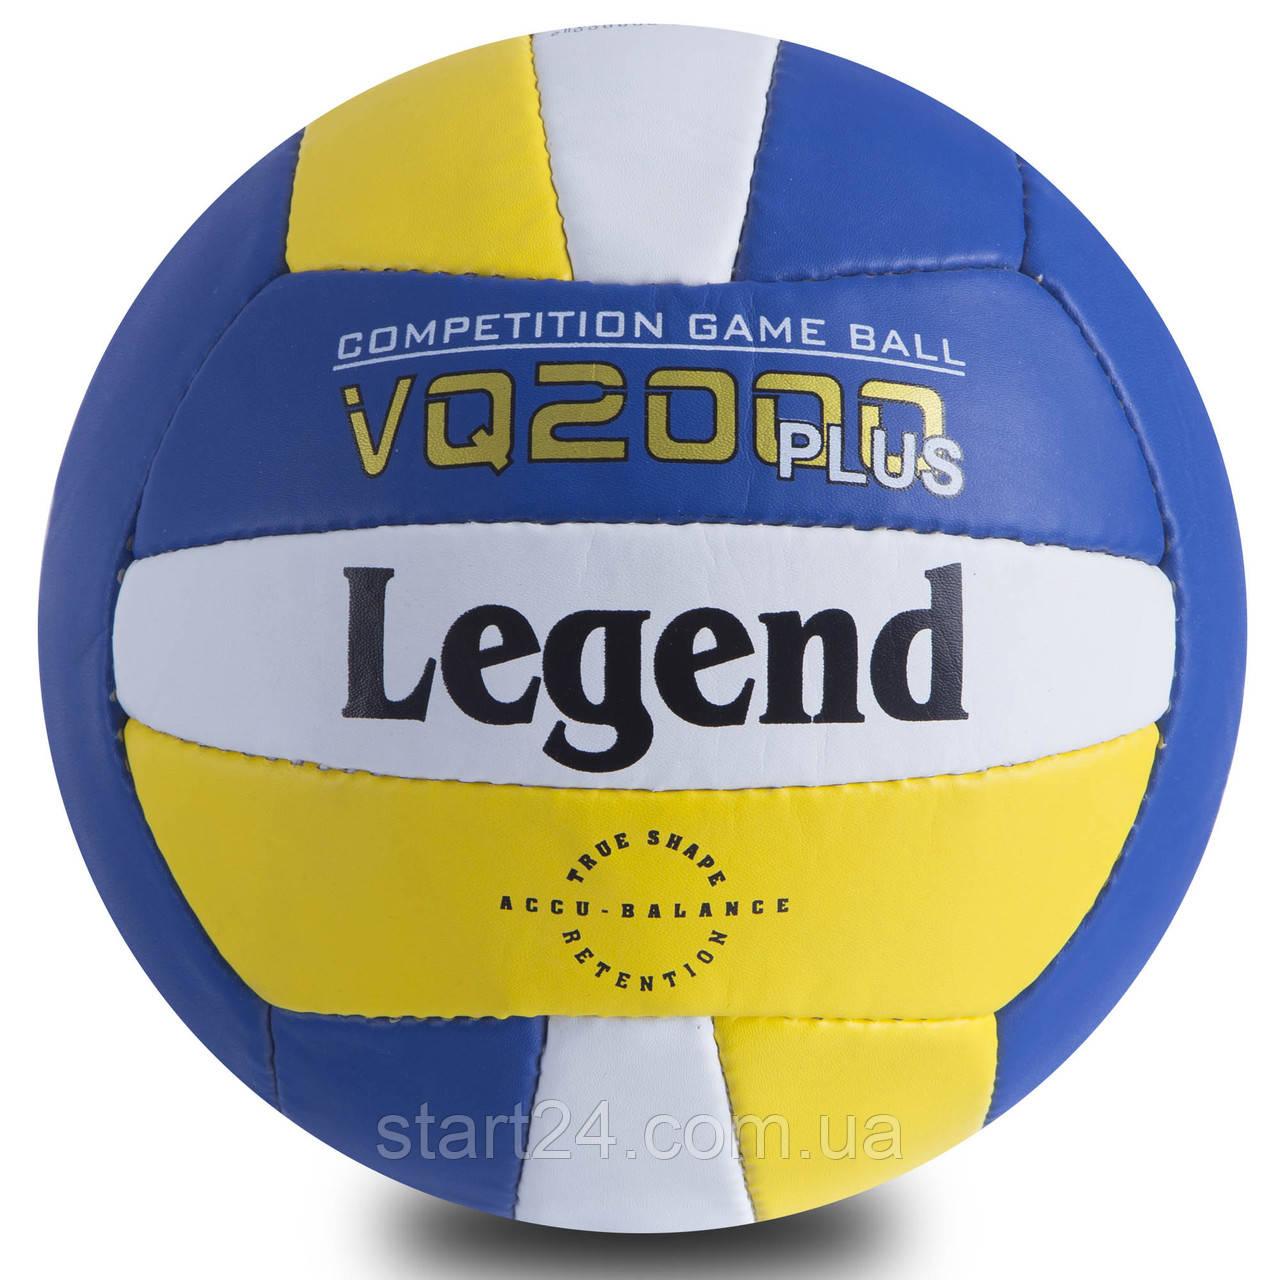 М'яч волейбольний PU LEGEND LG-0691 (PU, №5, 3 шари, зшитий вручну)